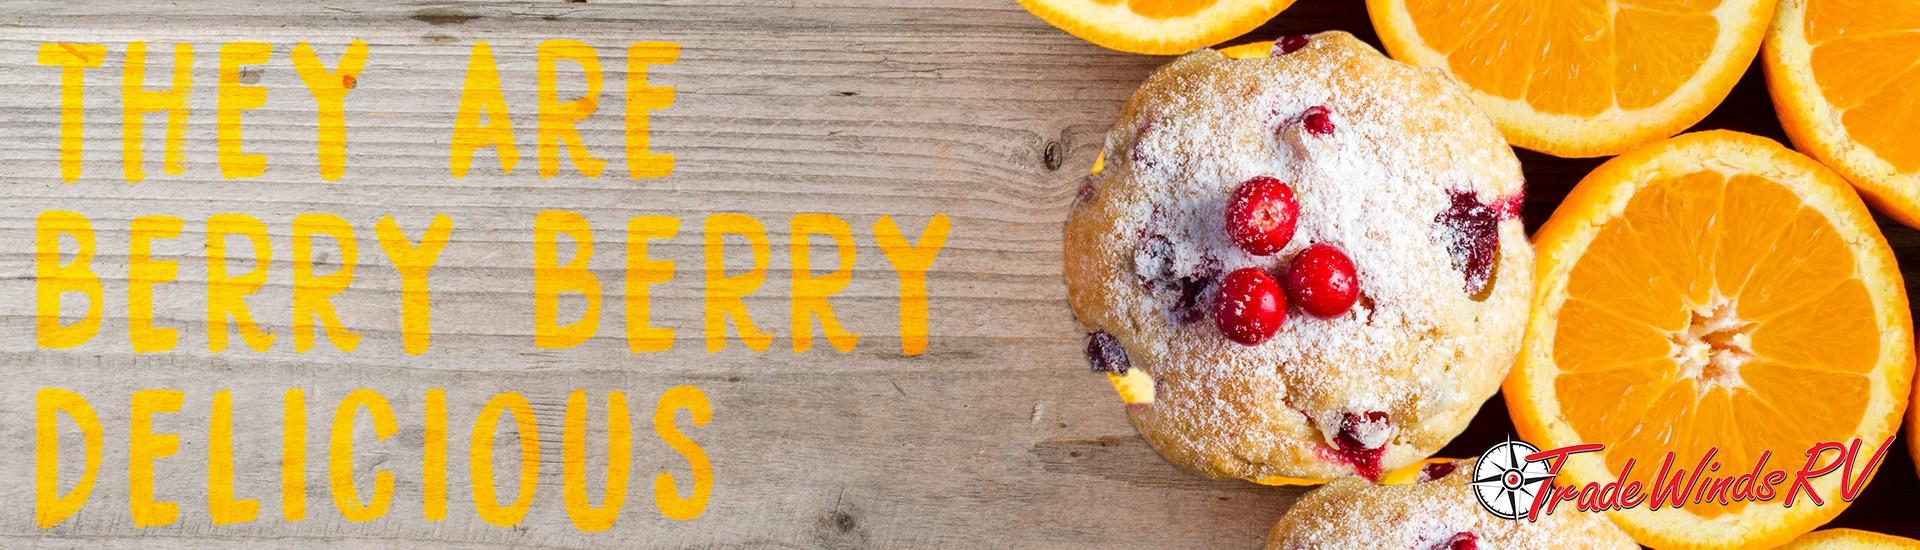 berry berry delicious